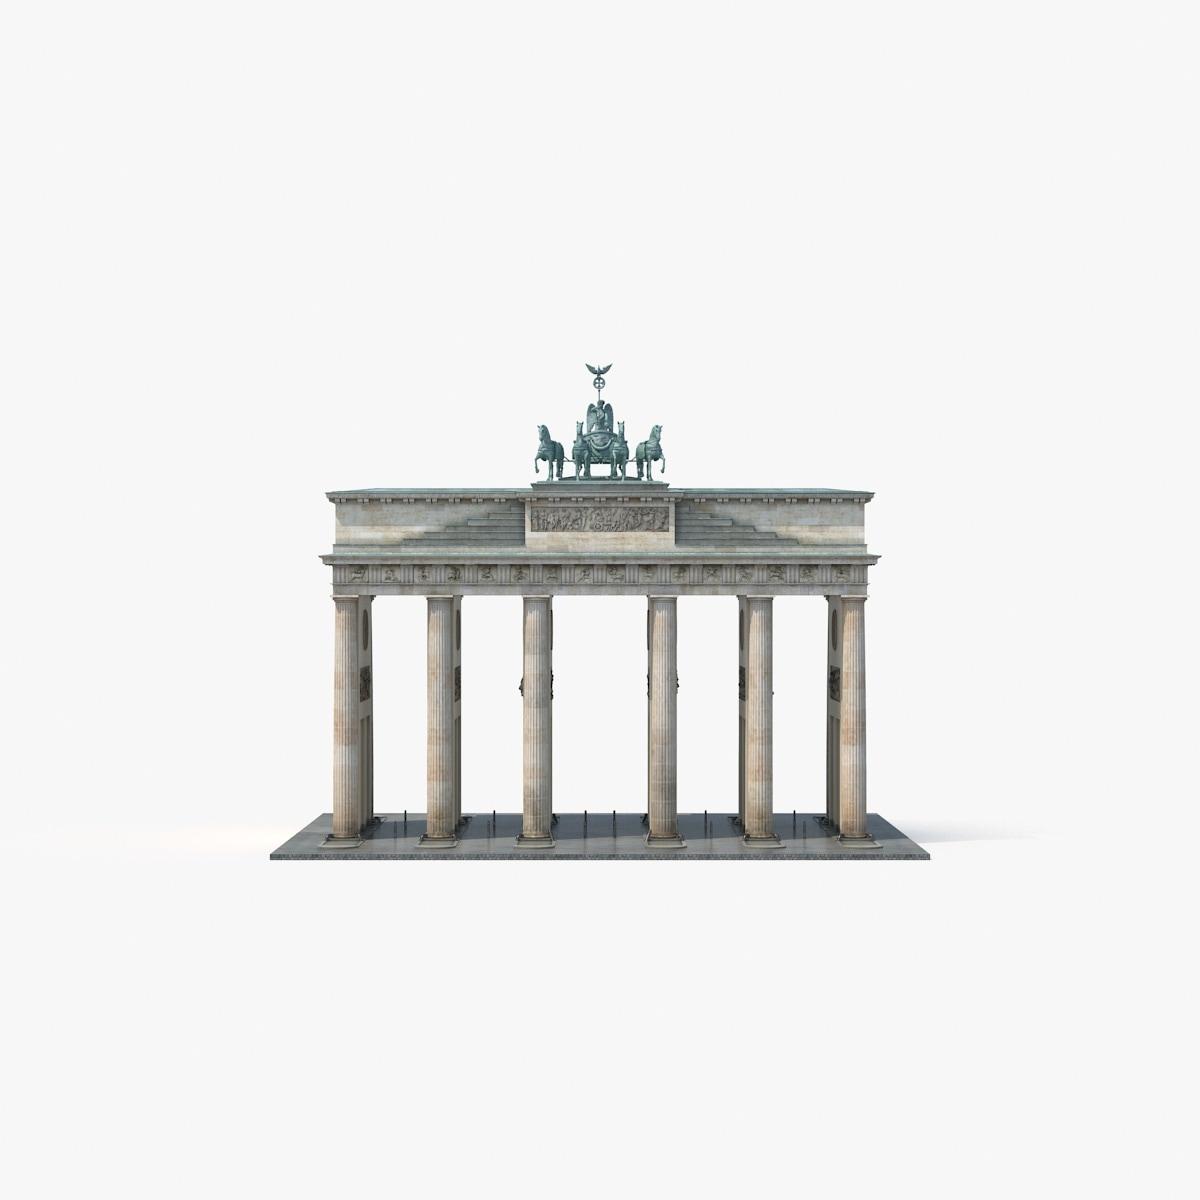 Branderburg_Gate_SQRSignature_0000.jpg